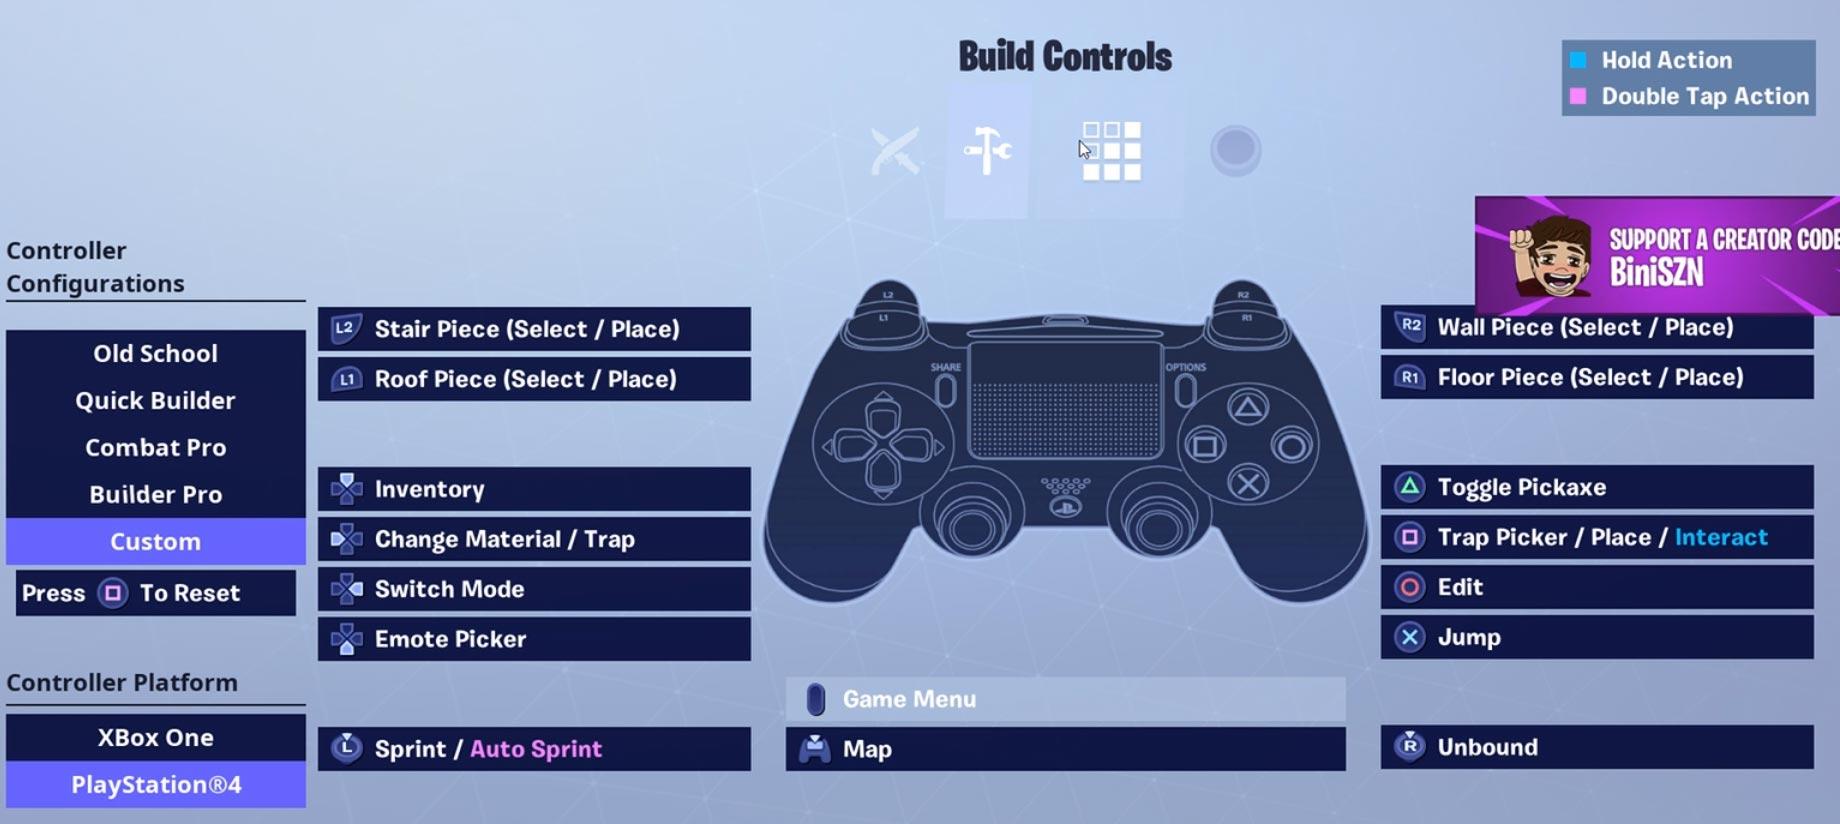 Jaomock Fortnite Settings Keybinds Config Sensitivity Gear 2019